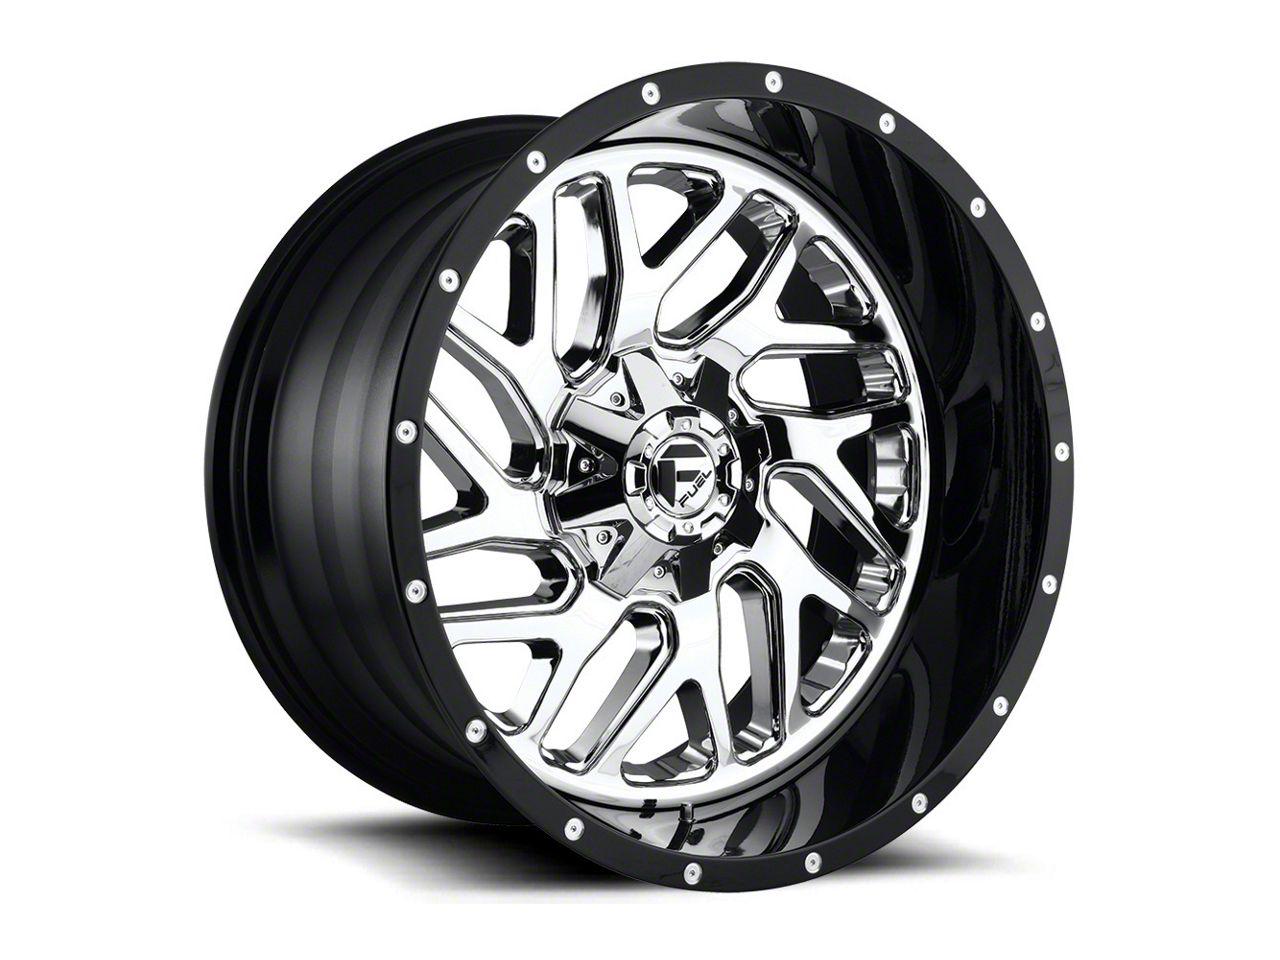 Fuel Wheels Triton Chrome 5-Lug Wheel - 20x12 (02-18 RAM 1500, Excluding Mega Cab)